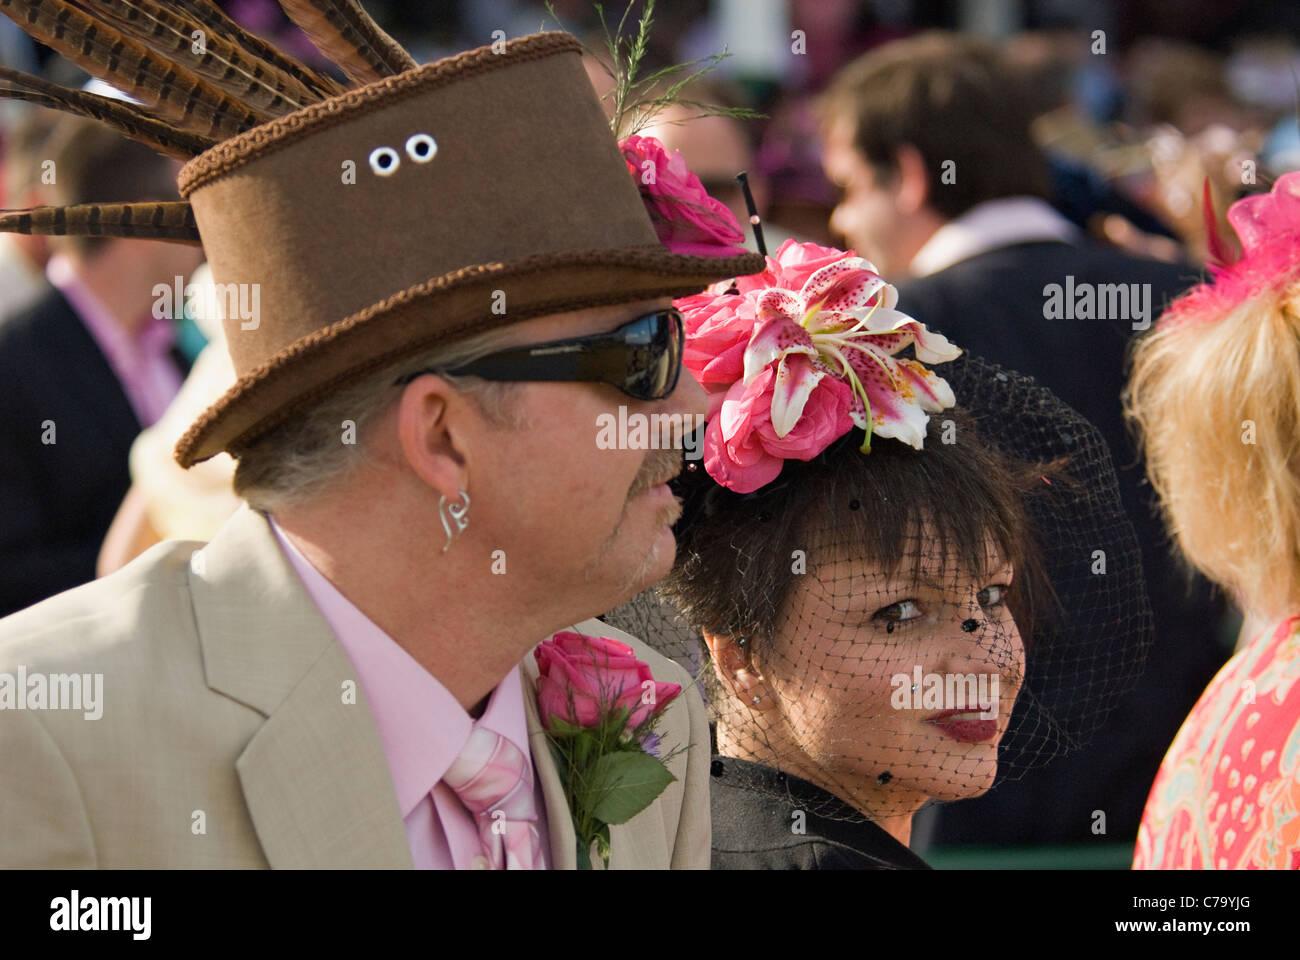 Top Hat With Veil Stockfotos & Top Hat With Veil Bilder - Alamy